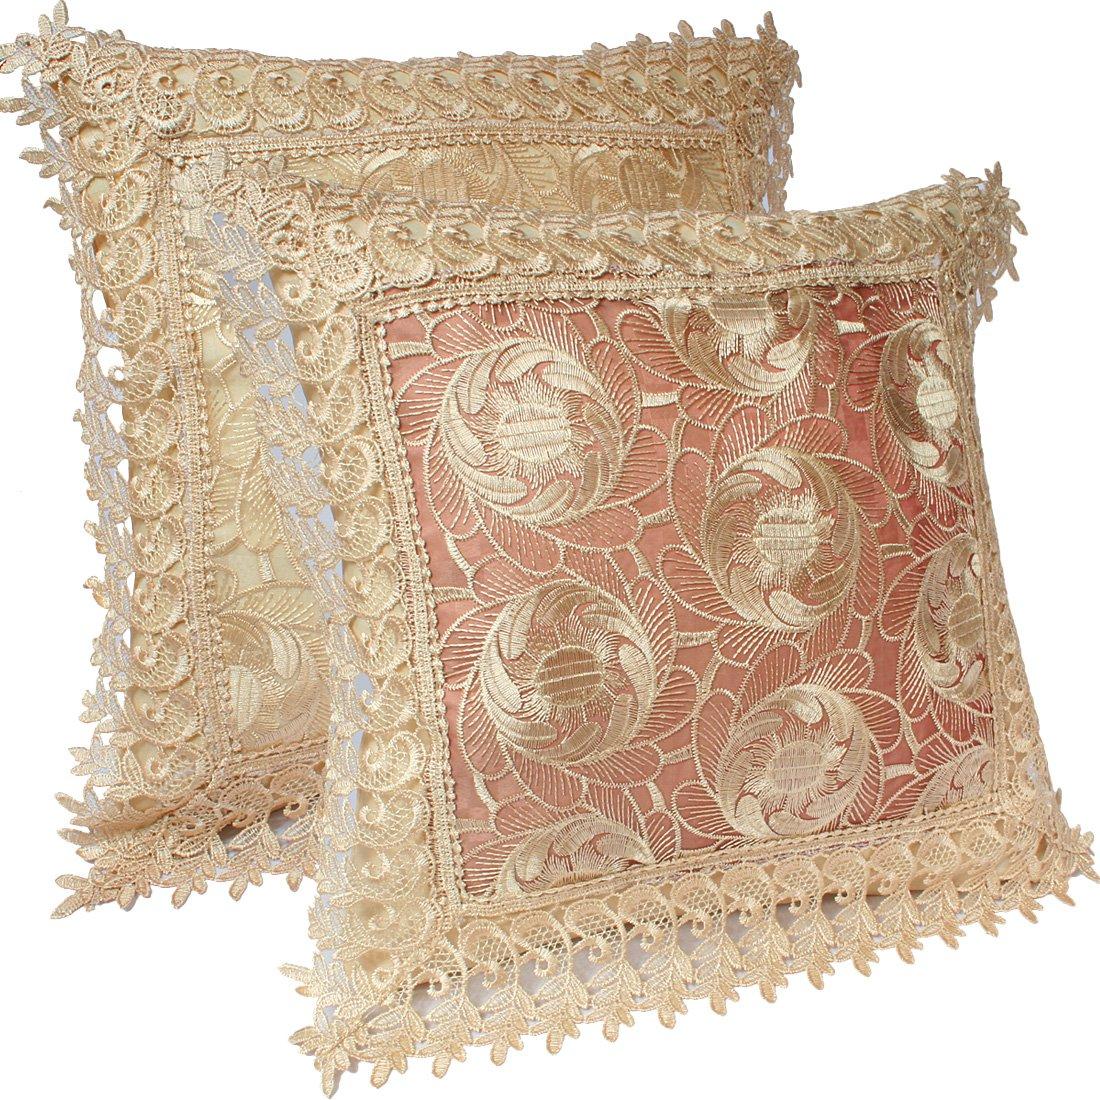 kilofly Decorative Vintage Lace Cushion Cover Pillow Case 15 x 15, Set of 2 5951146